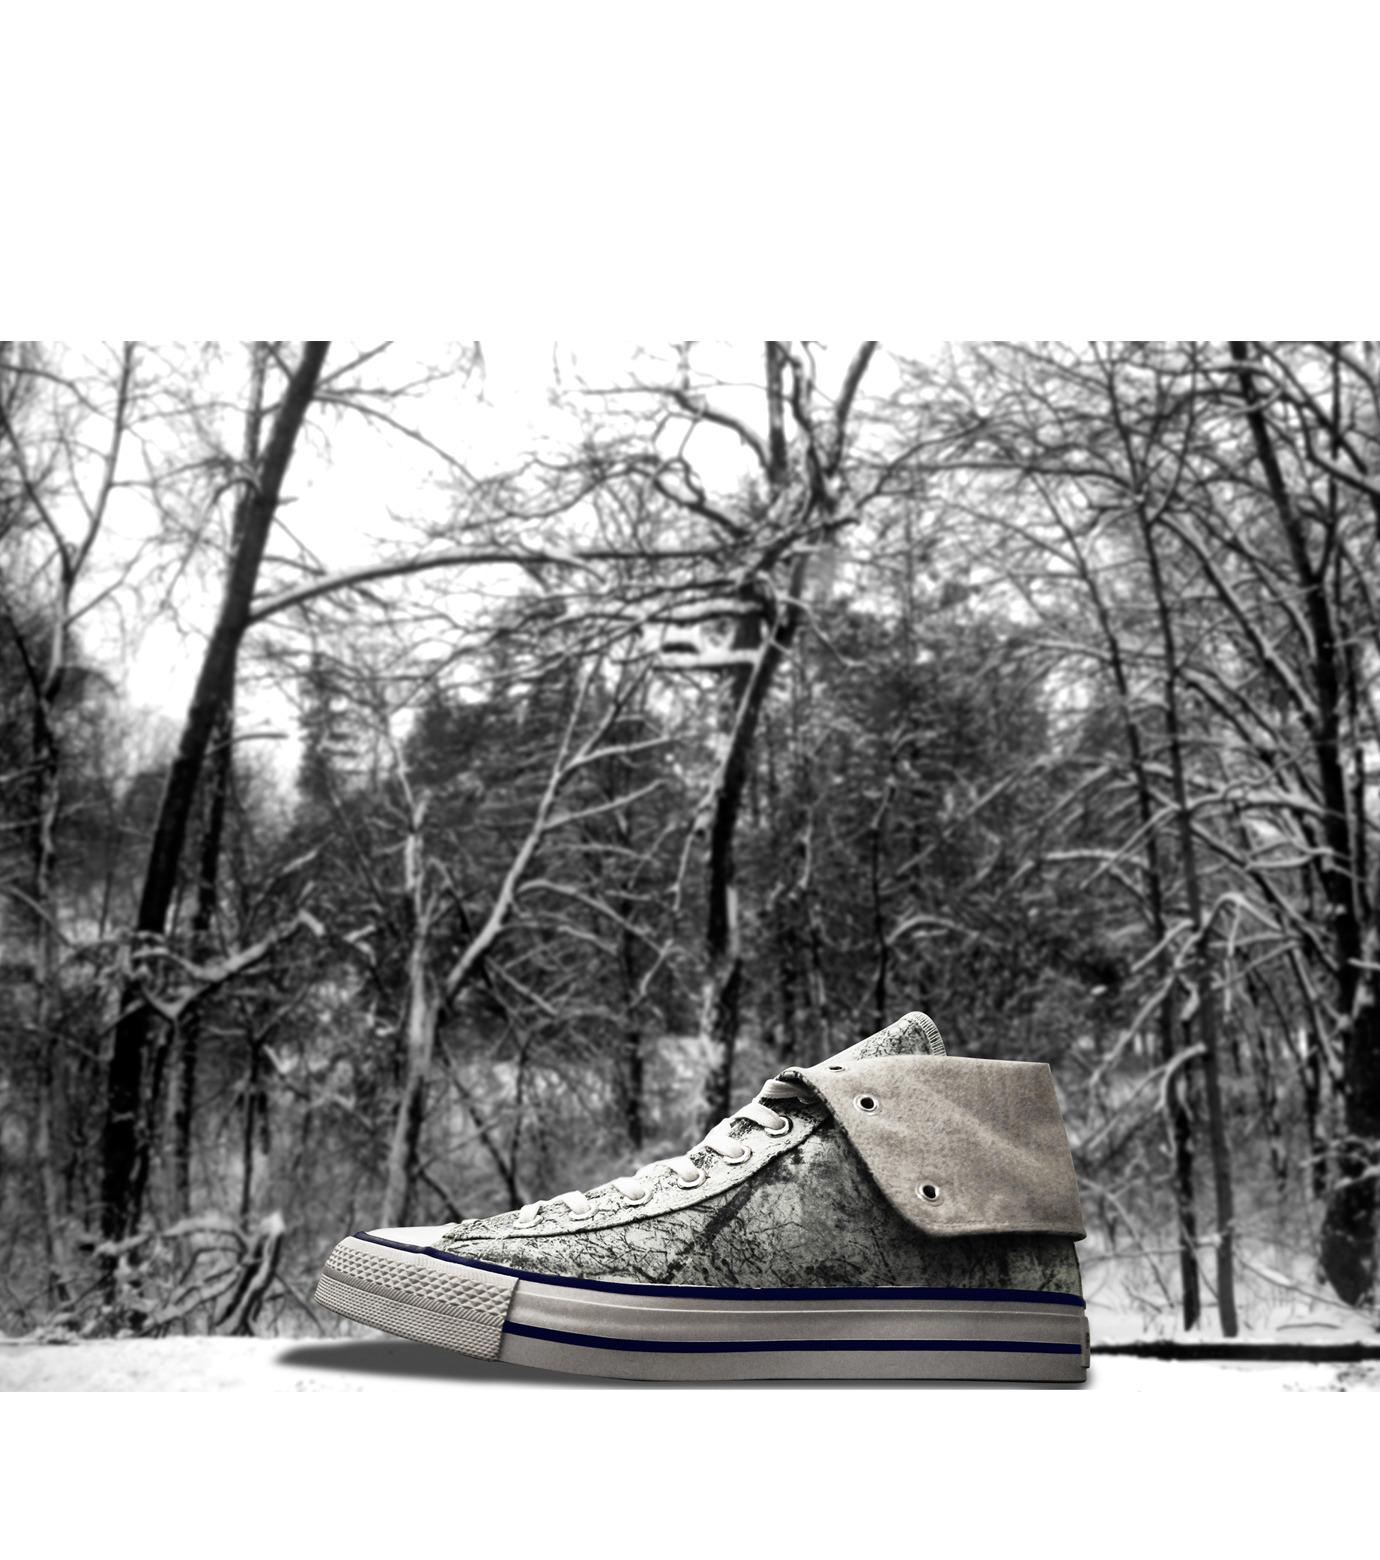 Facetasm(ファセッタズム)のRESTIR EXCLUSIVE SNEAKERS-LIGHT GRAY(シューズ/shoes)-OA-SHO-WS-10 拡大詳細画像1